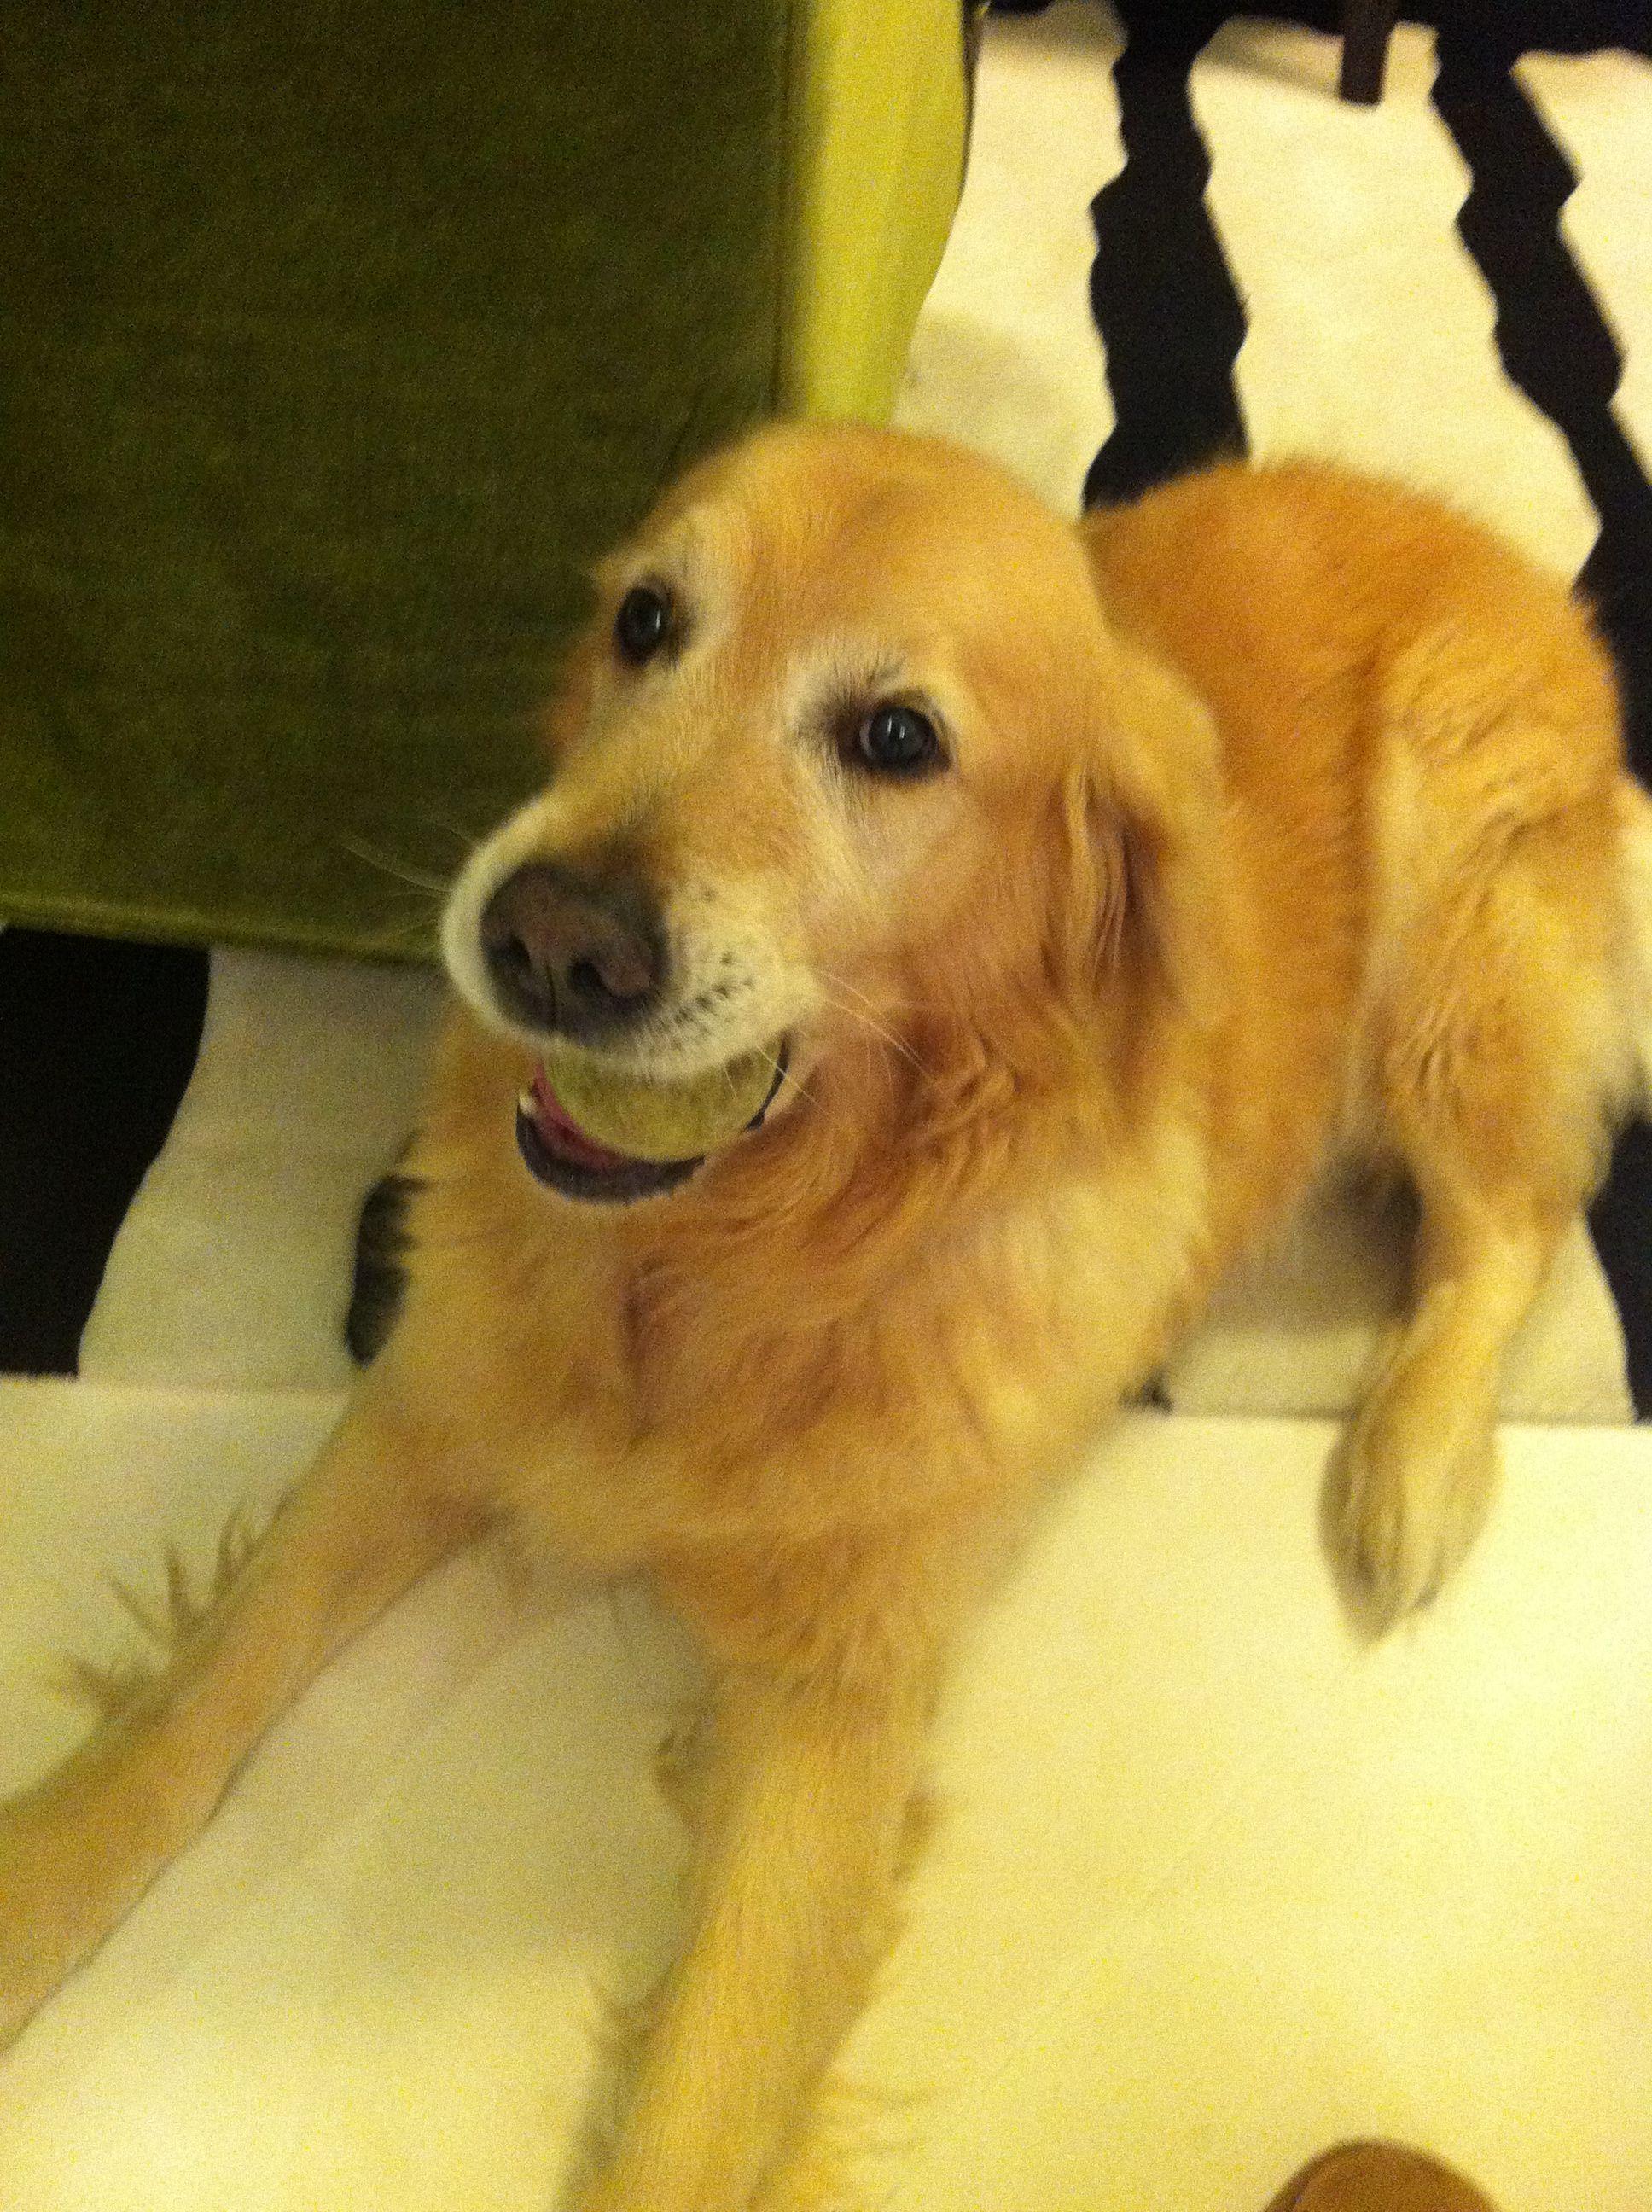 Doe Golden Retriever Pawshake Hong Kong Dogs Animals Hong Kong